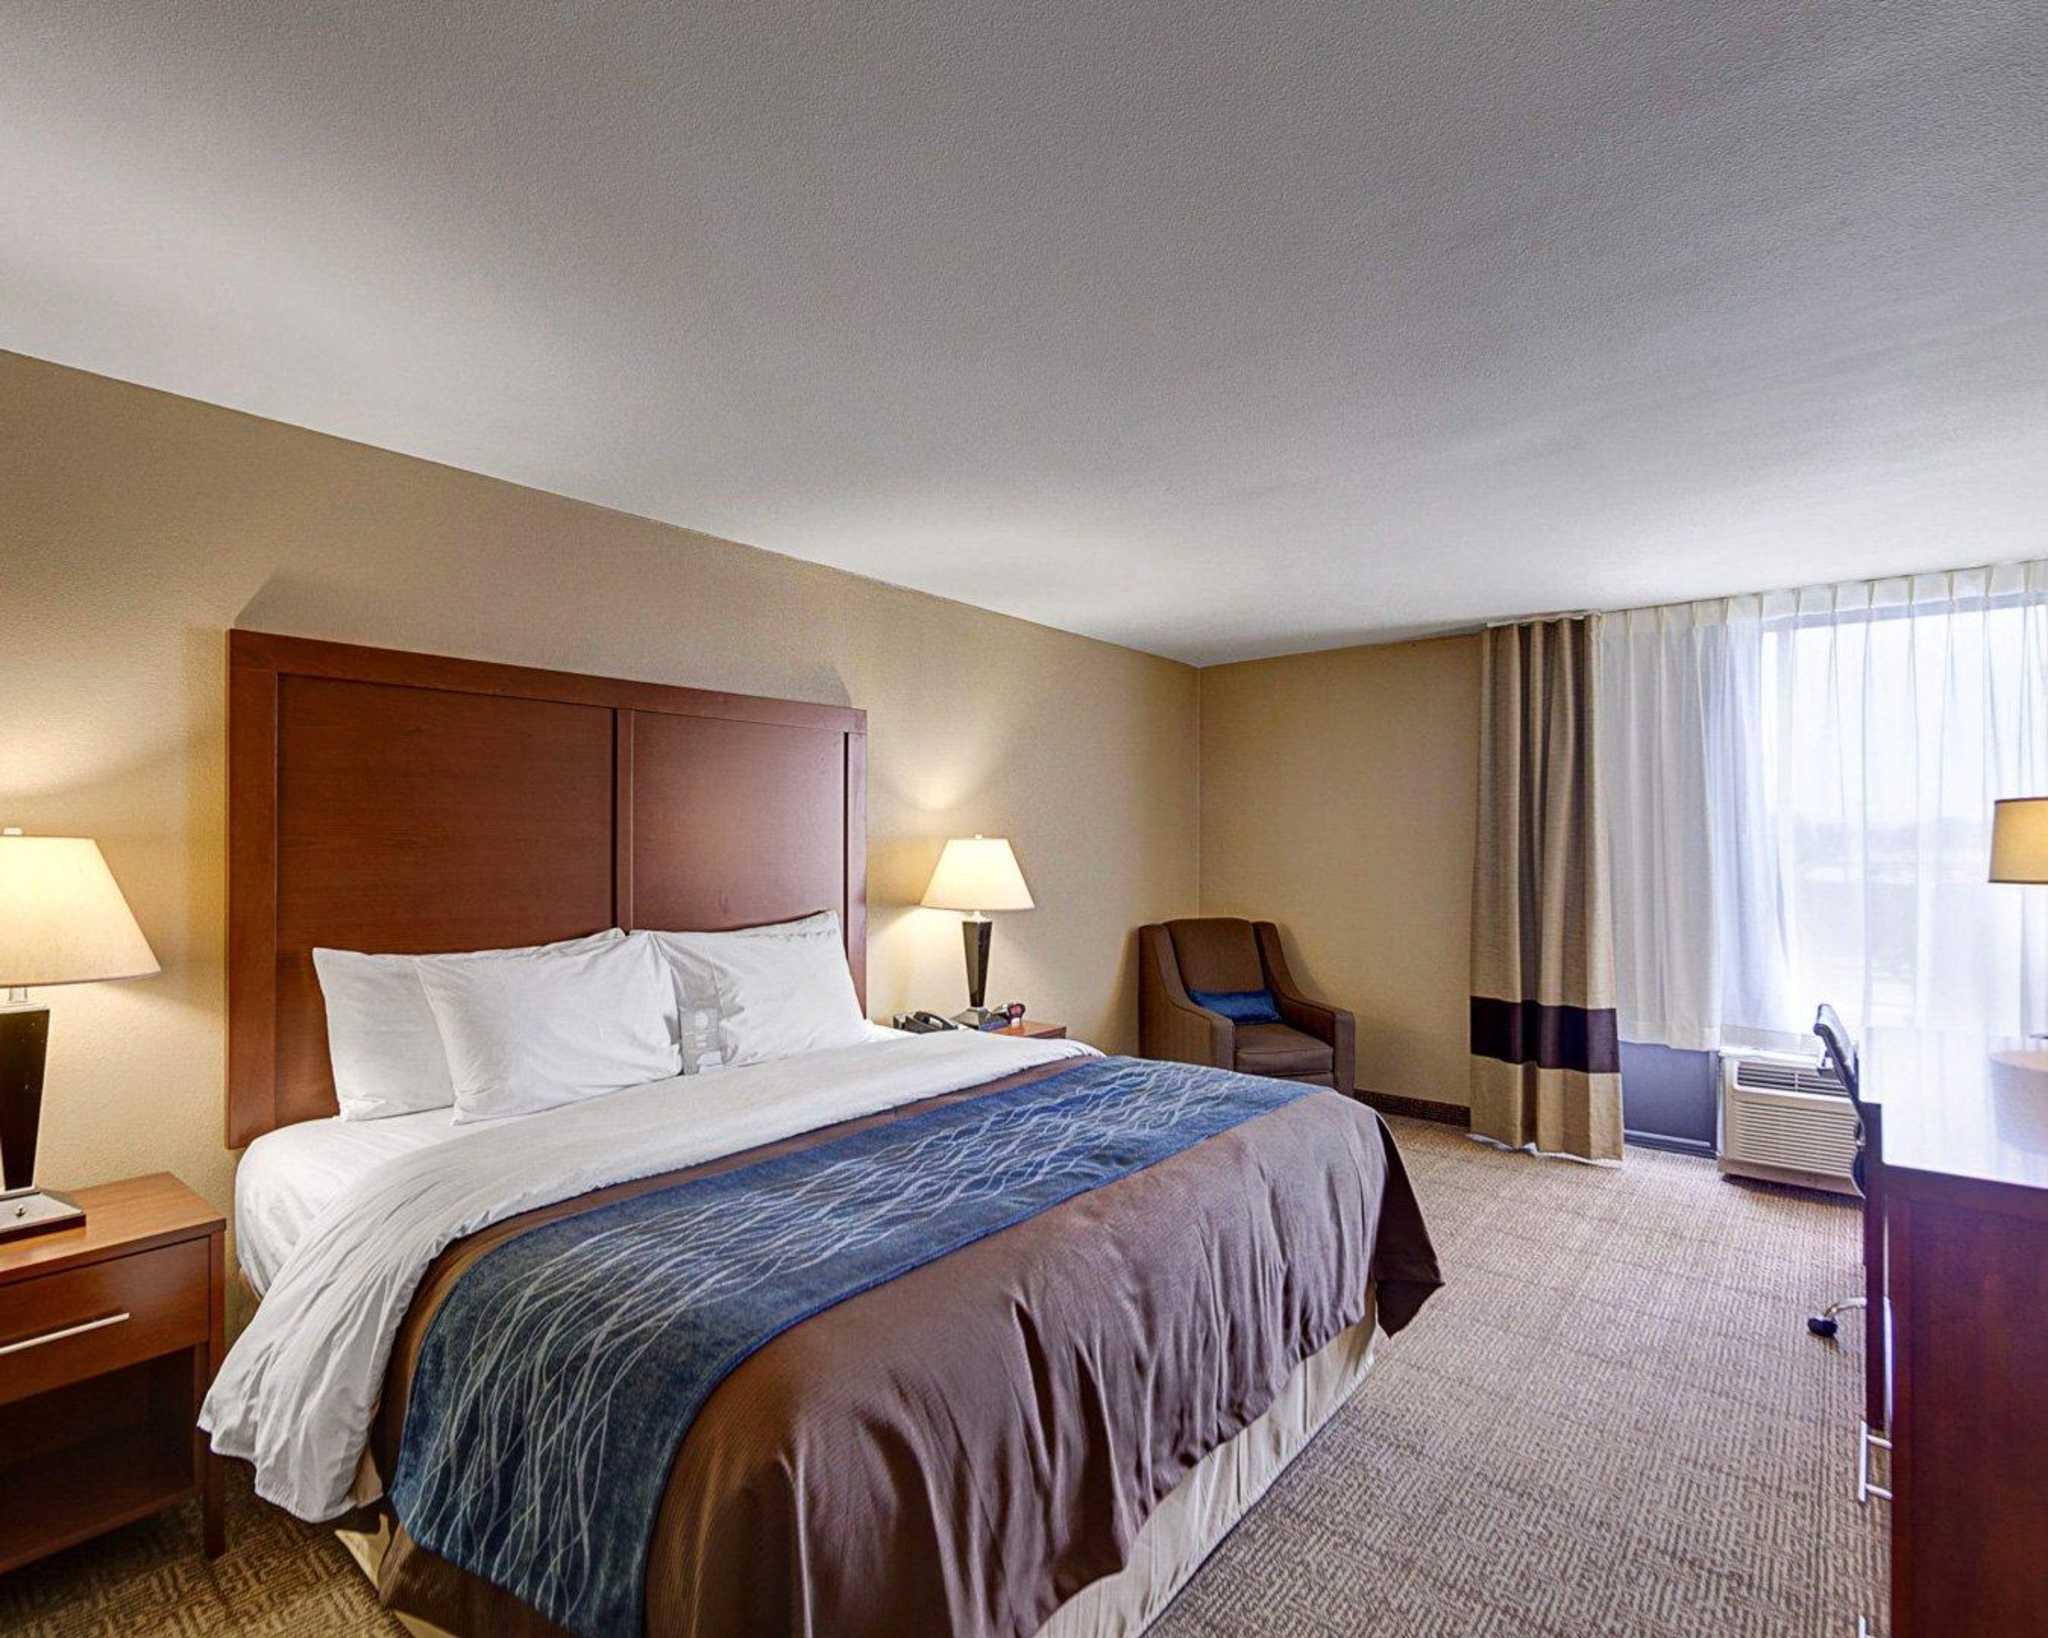 Comfort Inn & Suites Plano East image 4